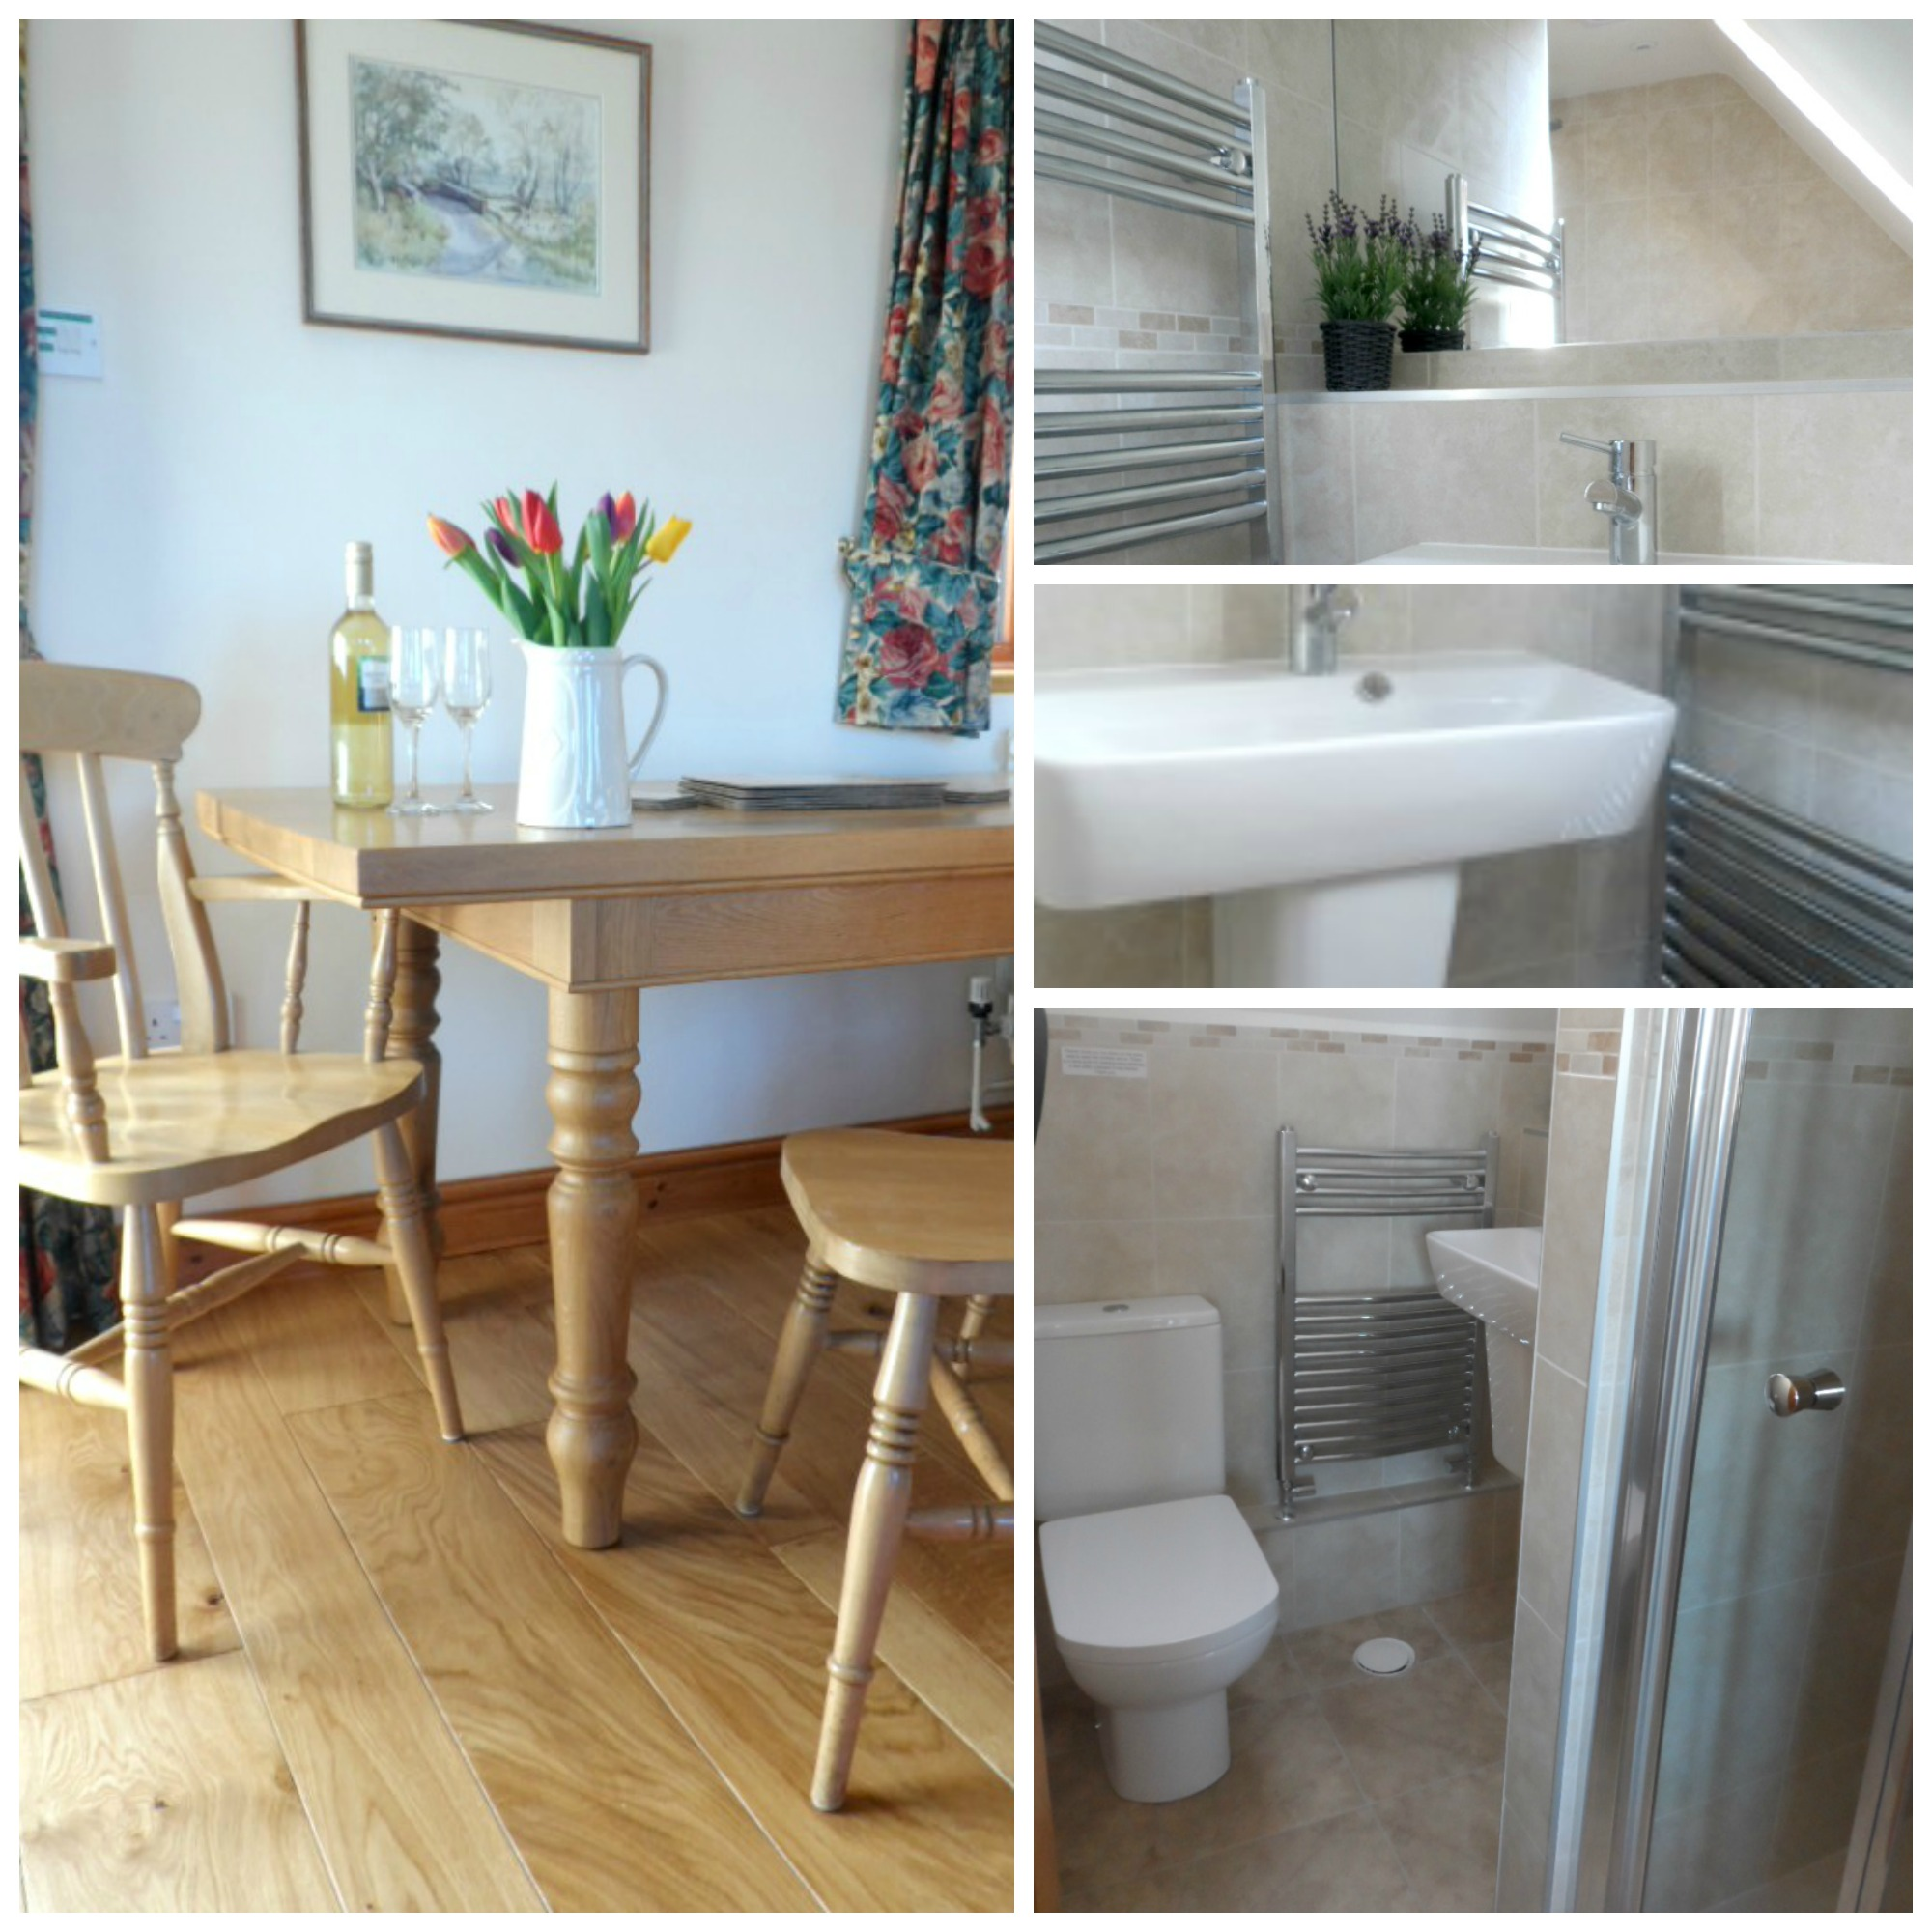 New Bathrooms and Oak Flooring in Sleeplate Cottage, Warwickshire stay in a farm cottage Warwickshire near Stratford